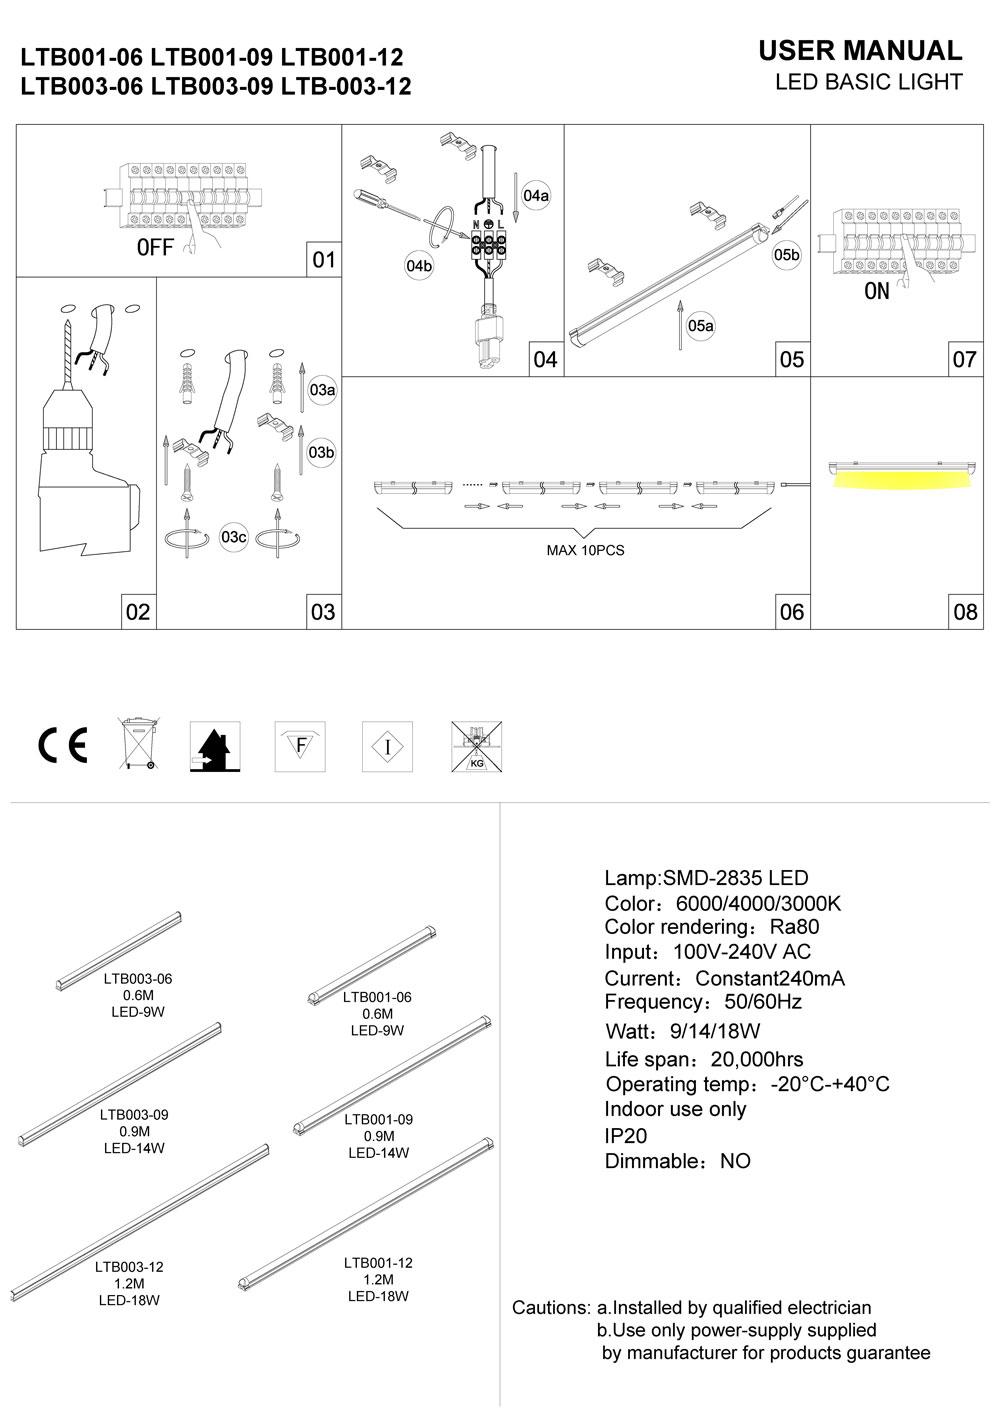 LTB003-undercabinet-light-installation guide